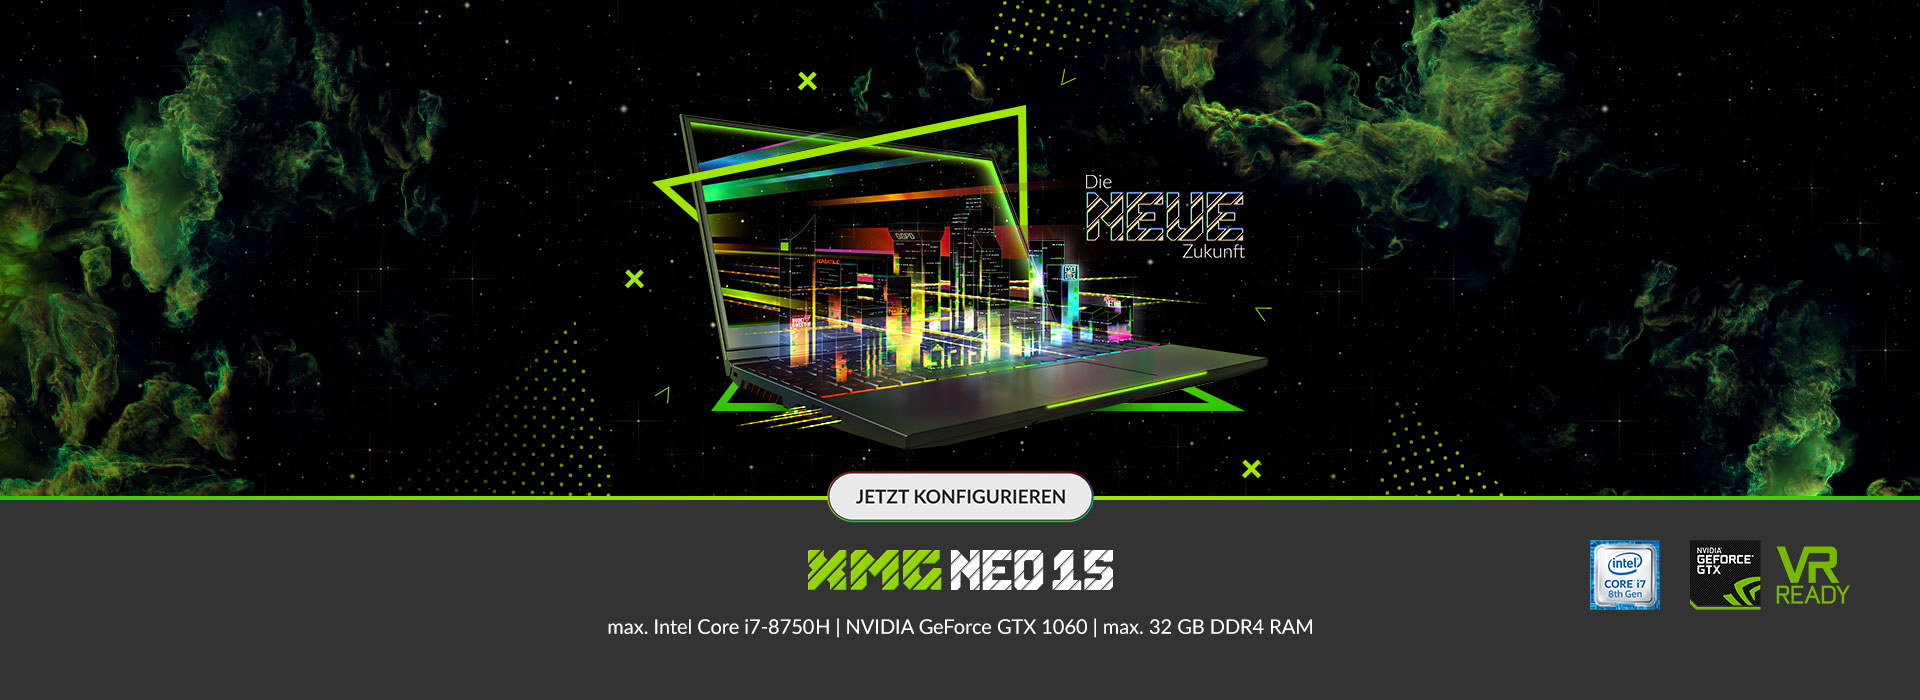 xmg neo 15 slider